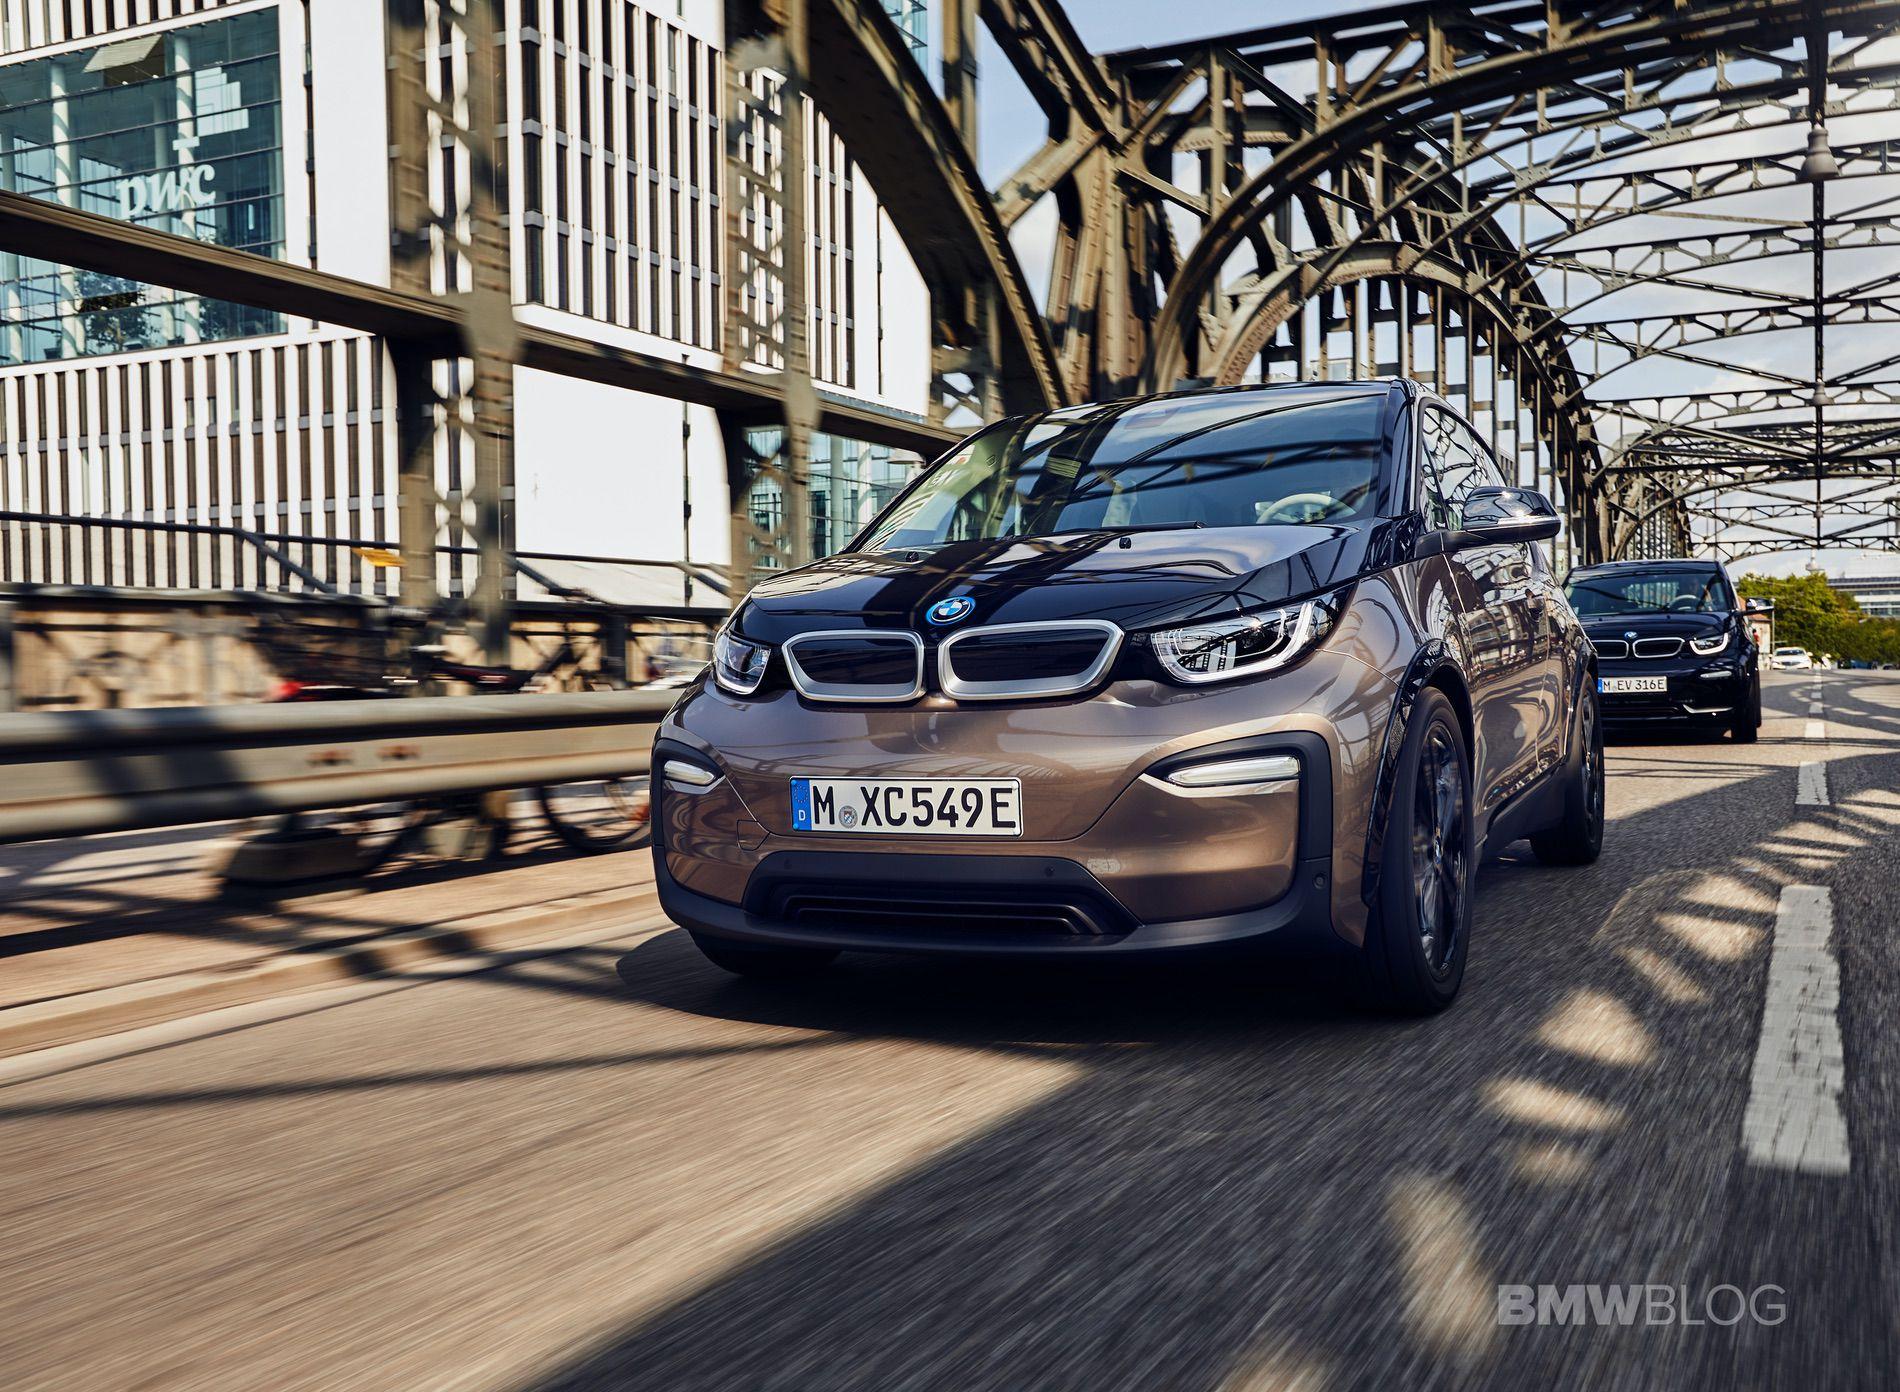 BMW i3 Jucaro Beige Metallic 03